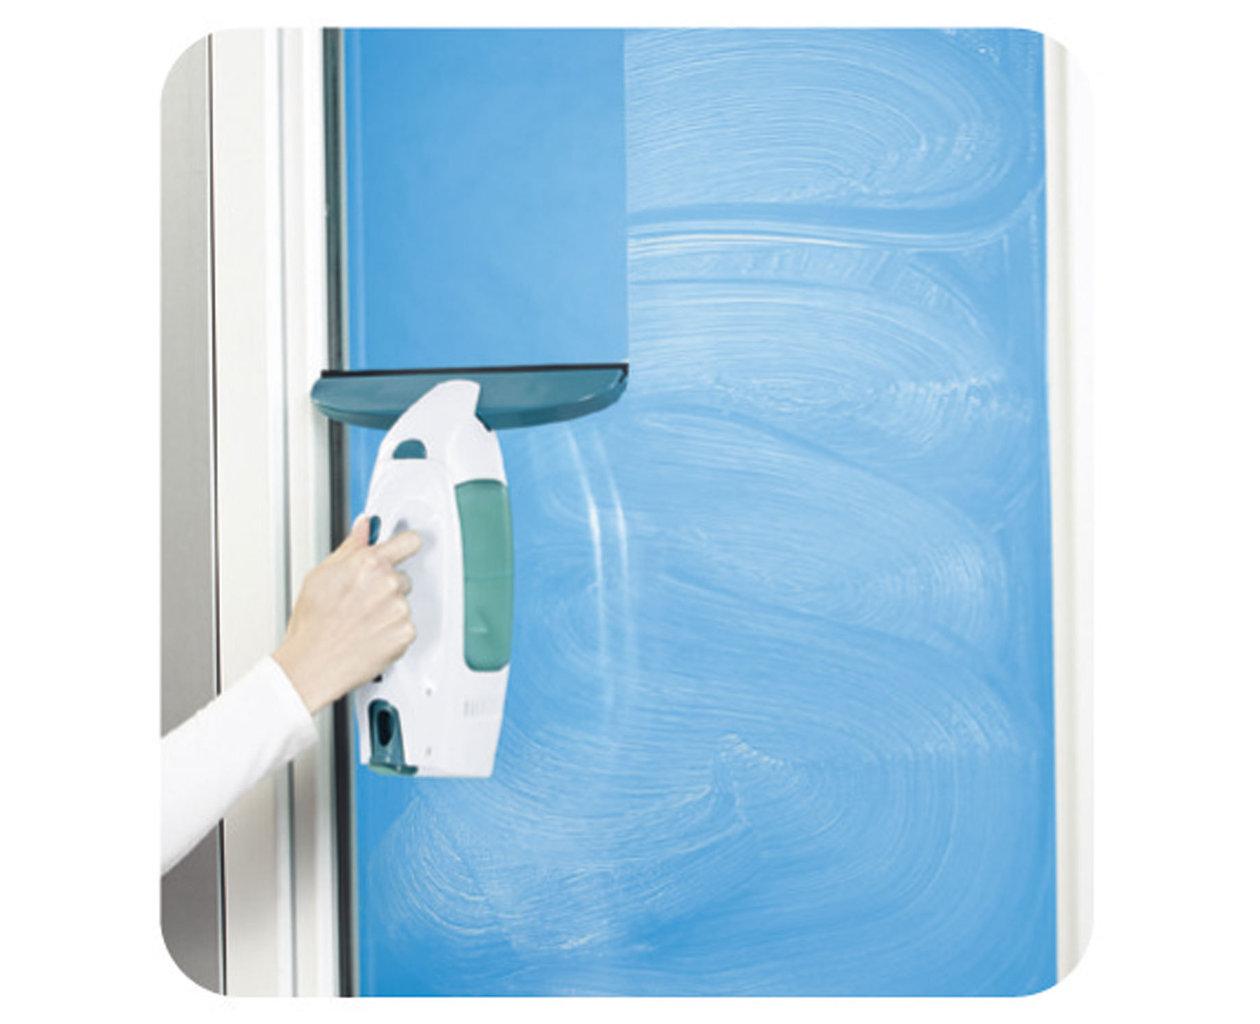 leifheit 51001 3 set lavavetri aspirante dry clean con manico. Black Bedroom Furniture Sets. Home Design Ideas